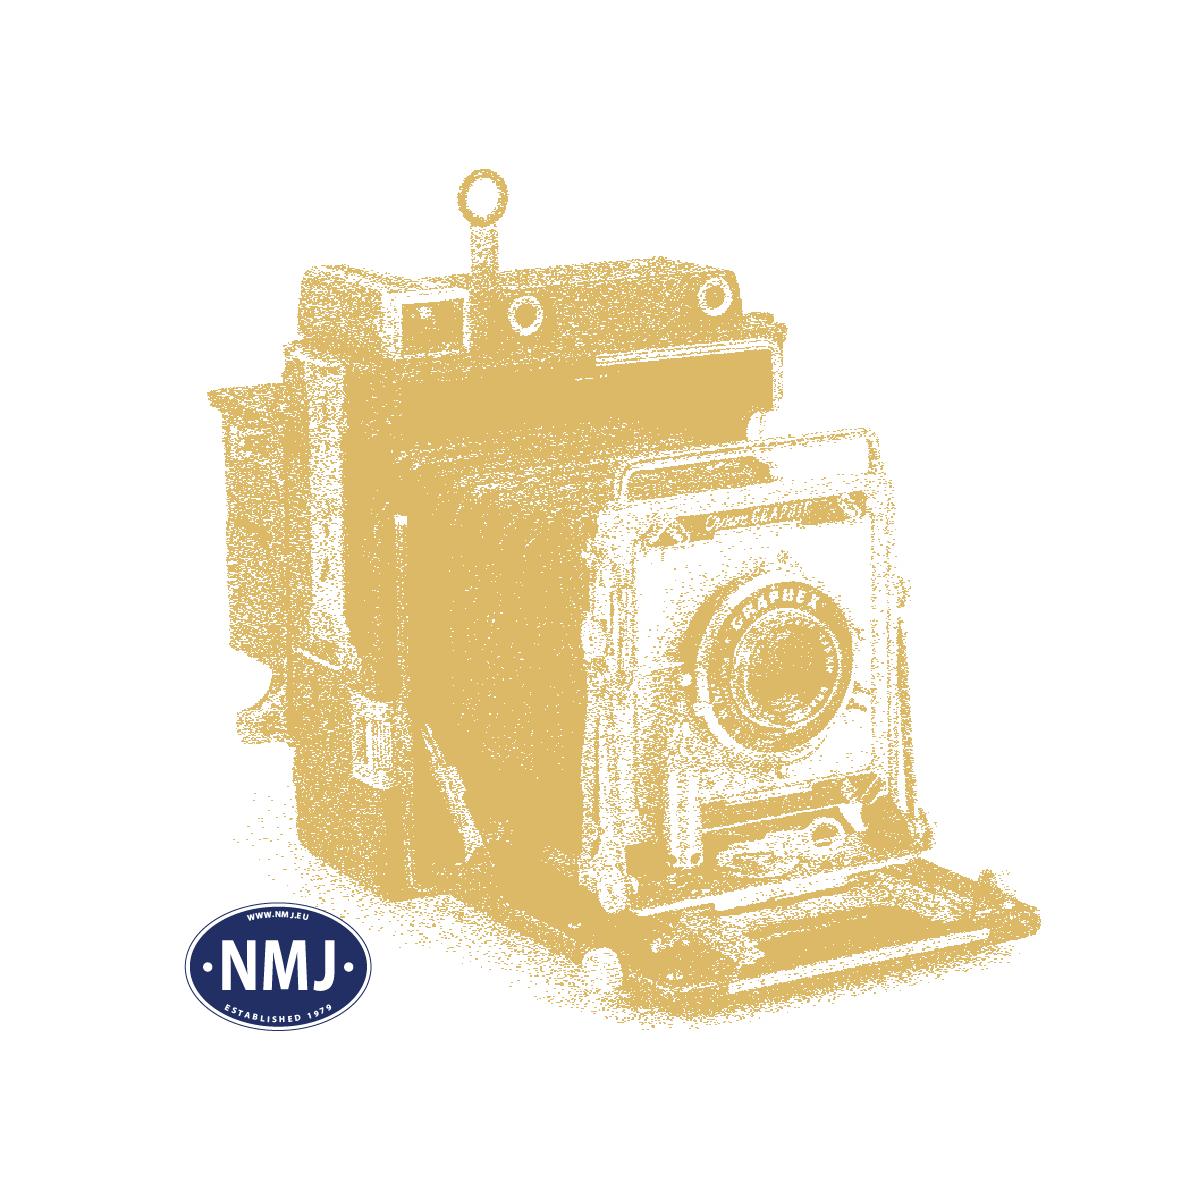 NMJ Superline NSB Tl3 10462, 0-Scala